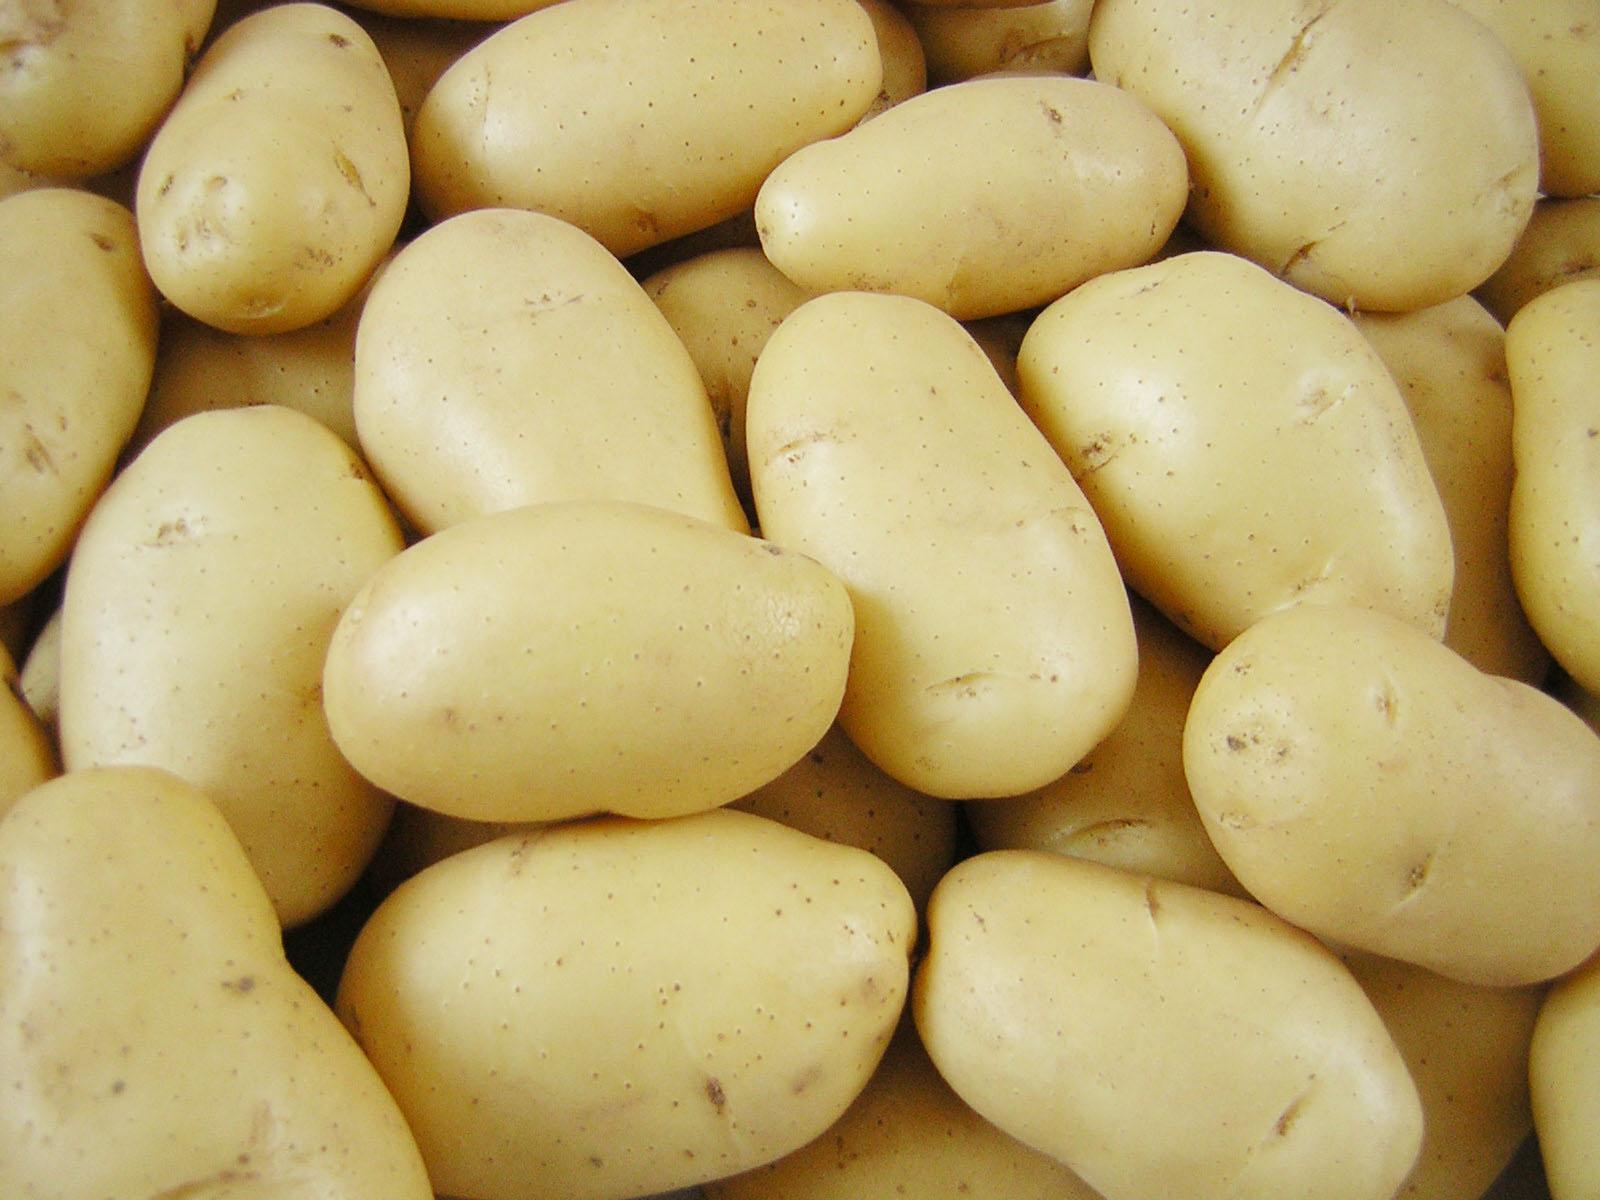 http://1.bp.blogspot.com/_eq9Ae3PzIVE/TMcbNIyrC2I/AAAAAAAAMnc/Qac2tpDyTds/s1600/batatas.jpg